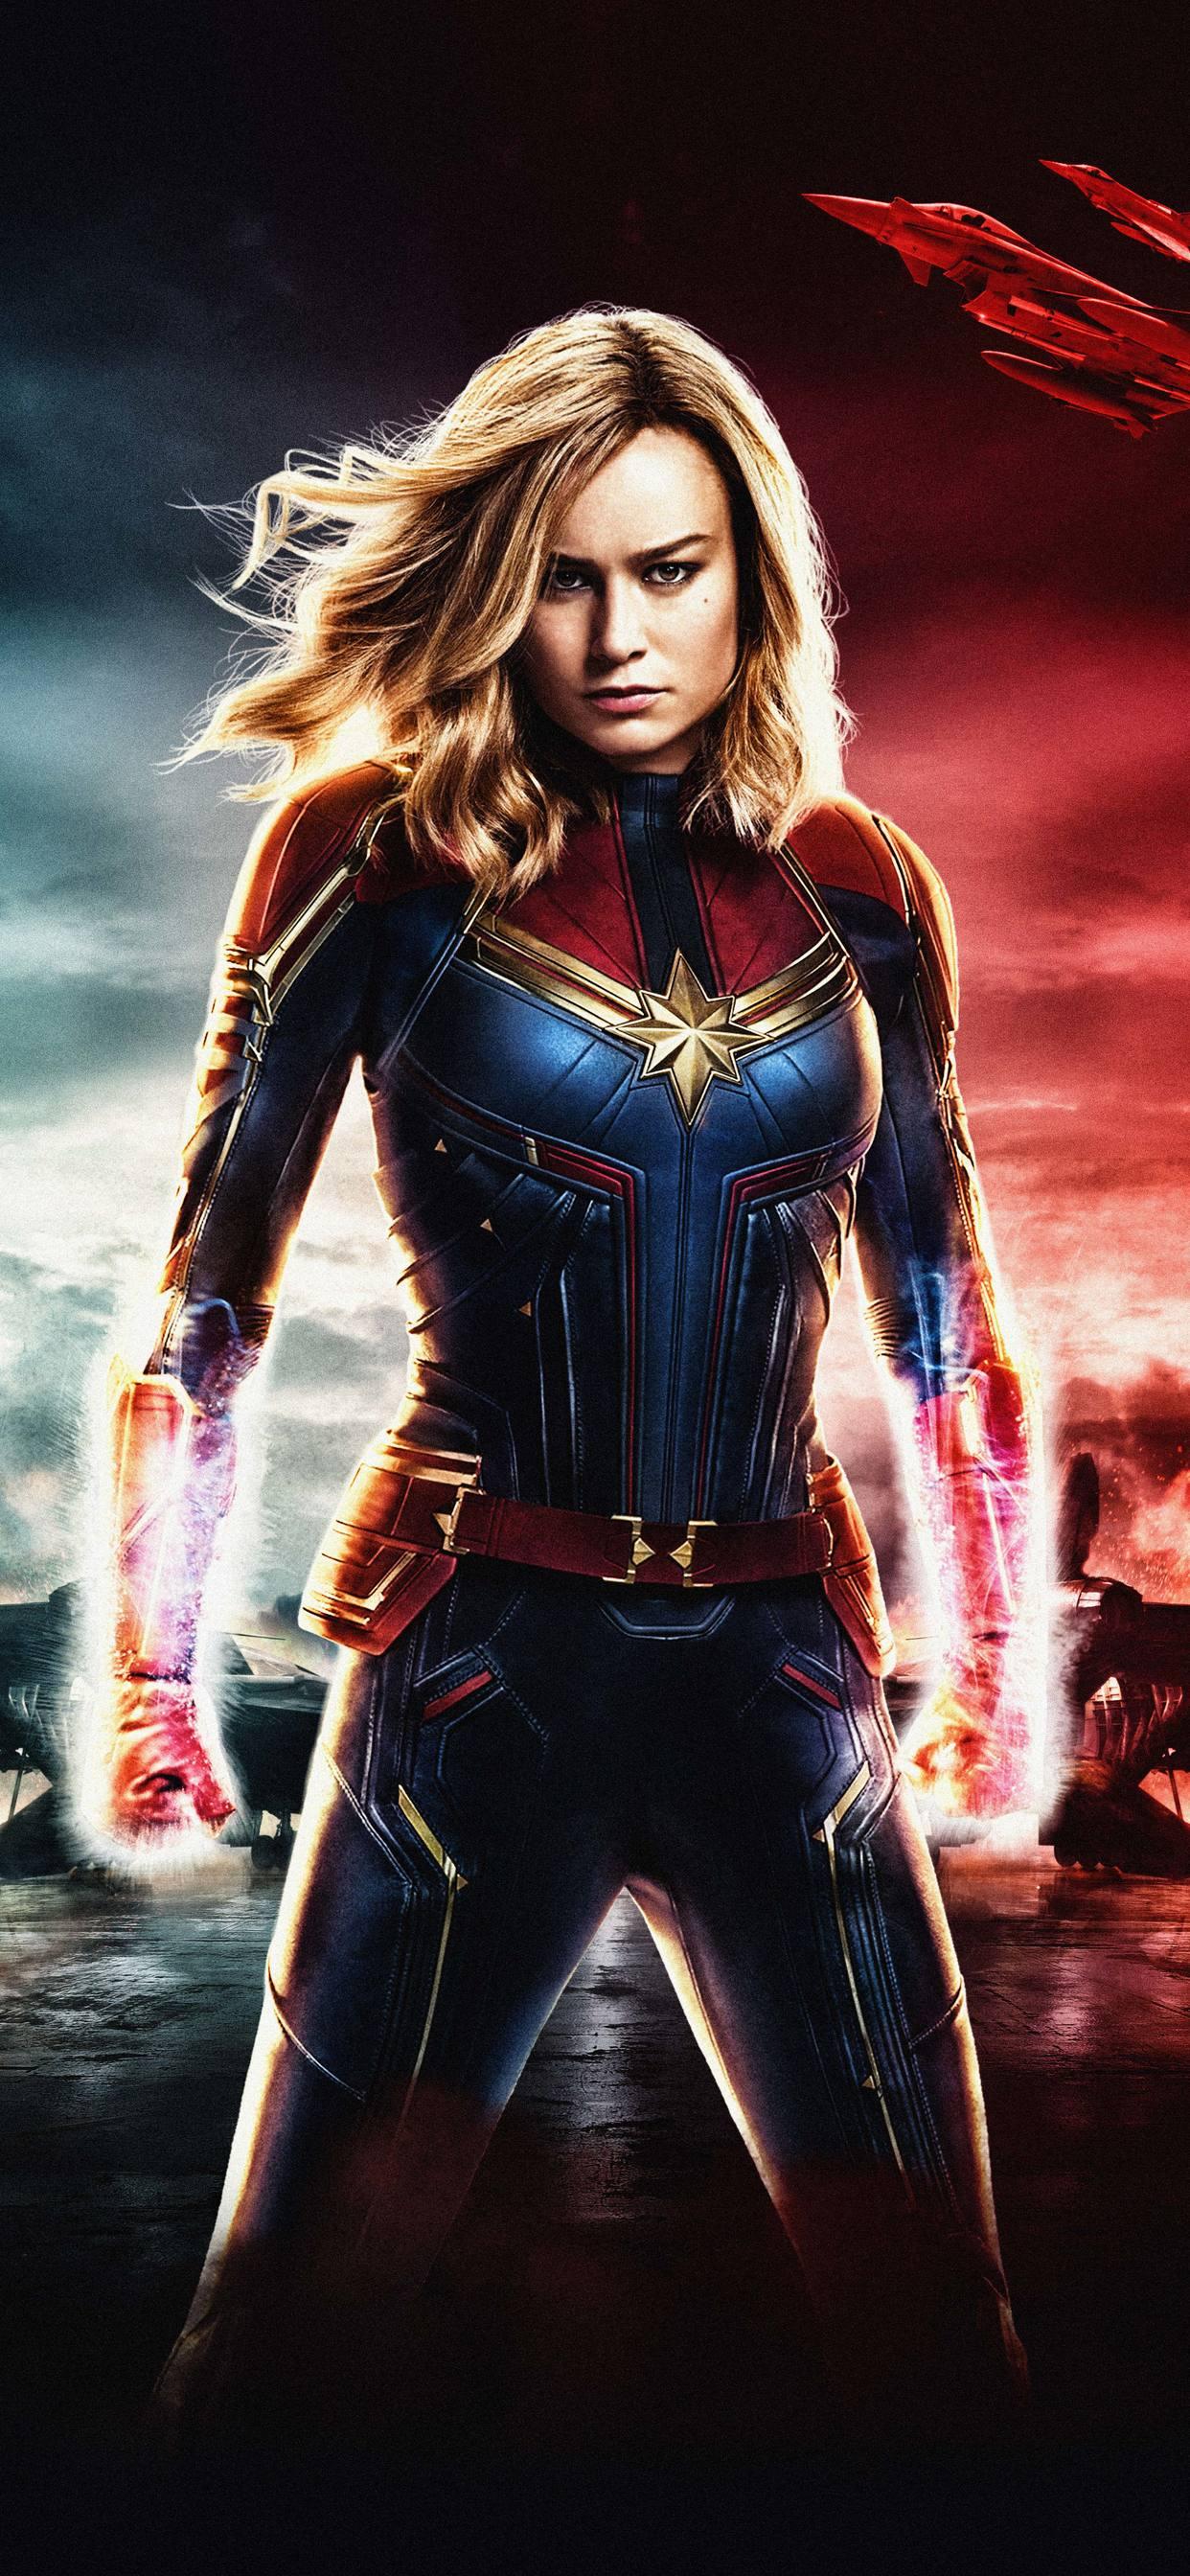 Iphone Xs Max Avengers Wallpaper : iphone, avengers, wallpaper, Iphone, Captain, Marvel, Wallpapers